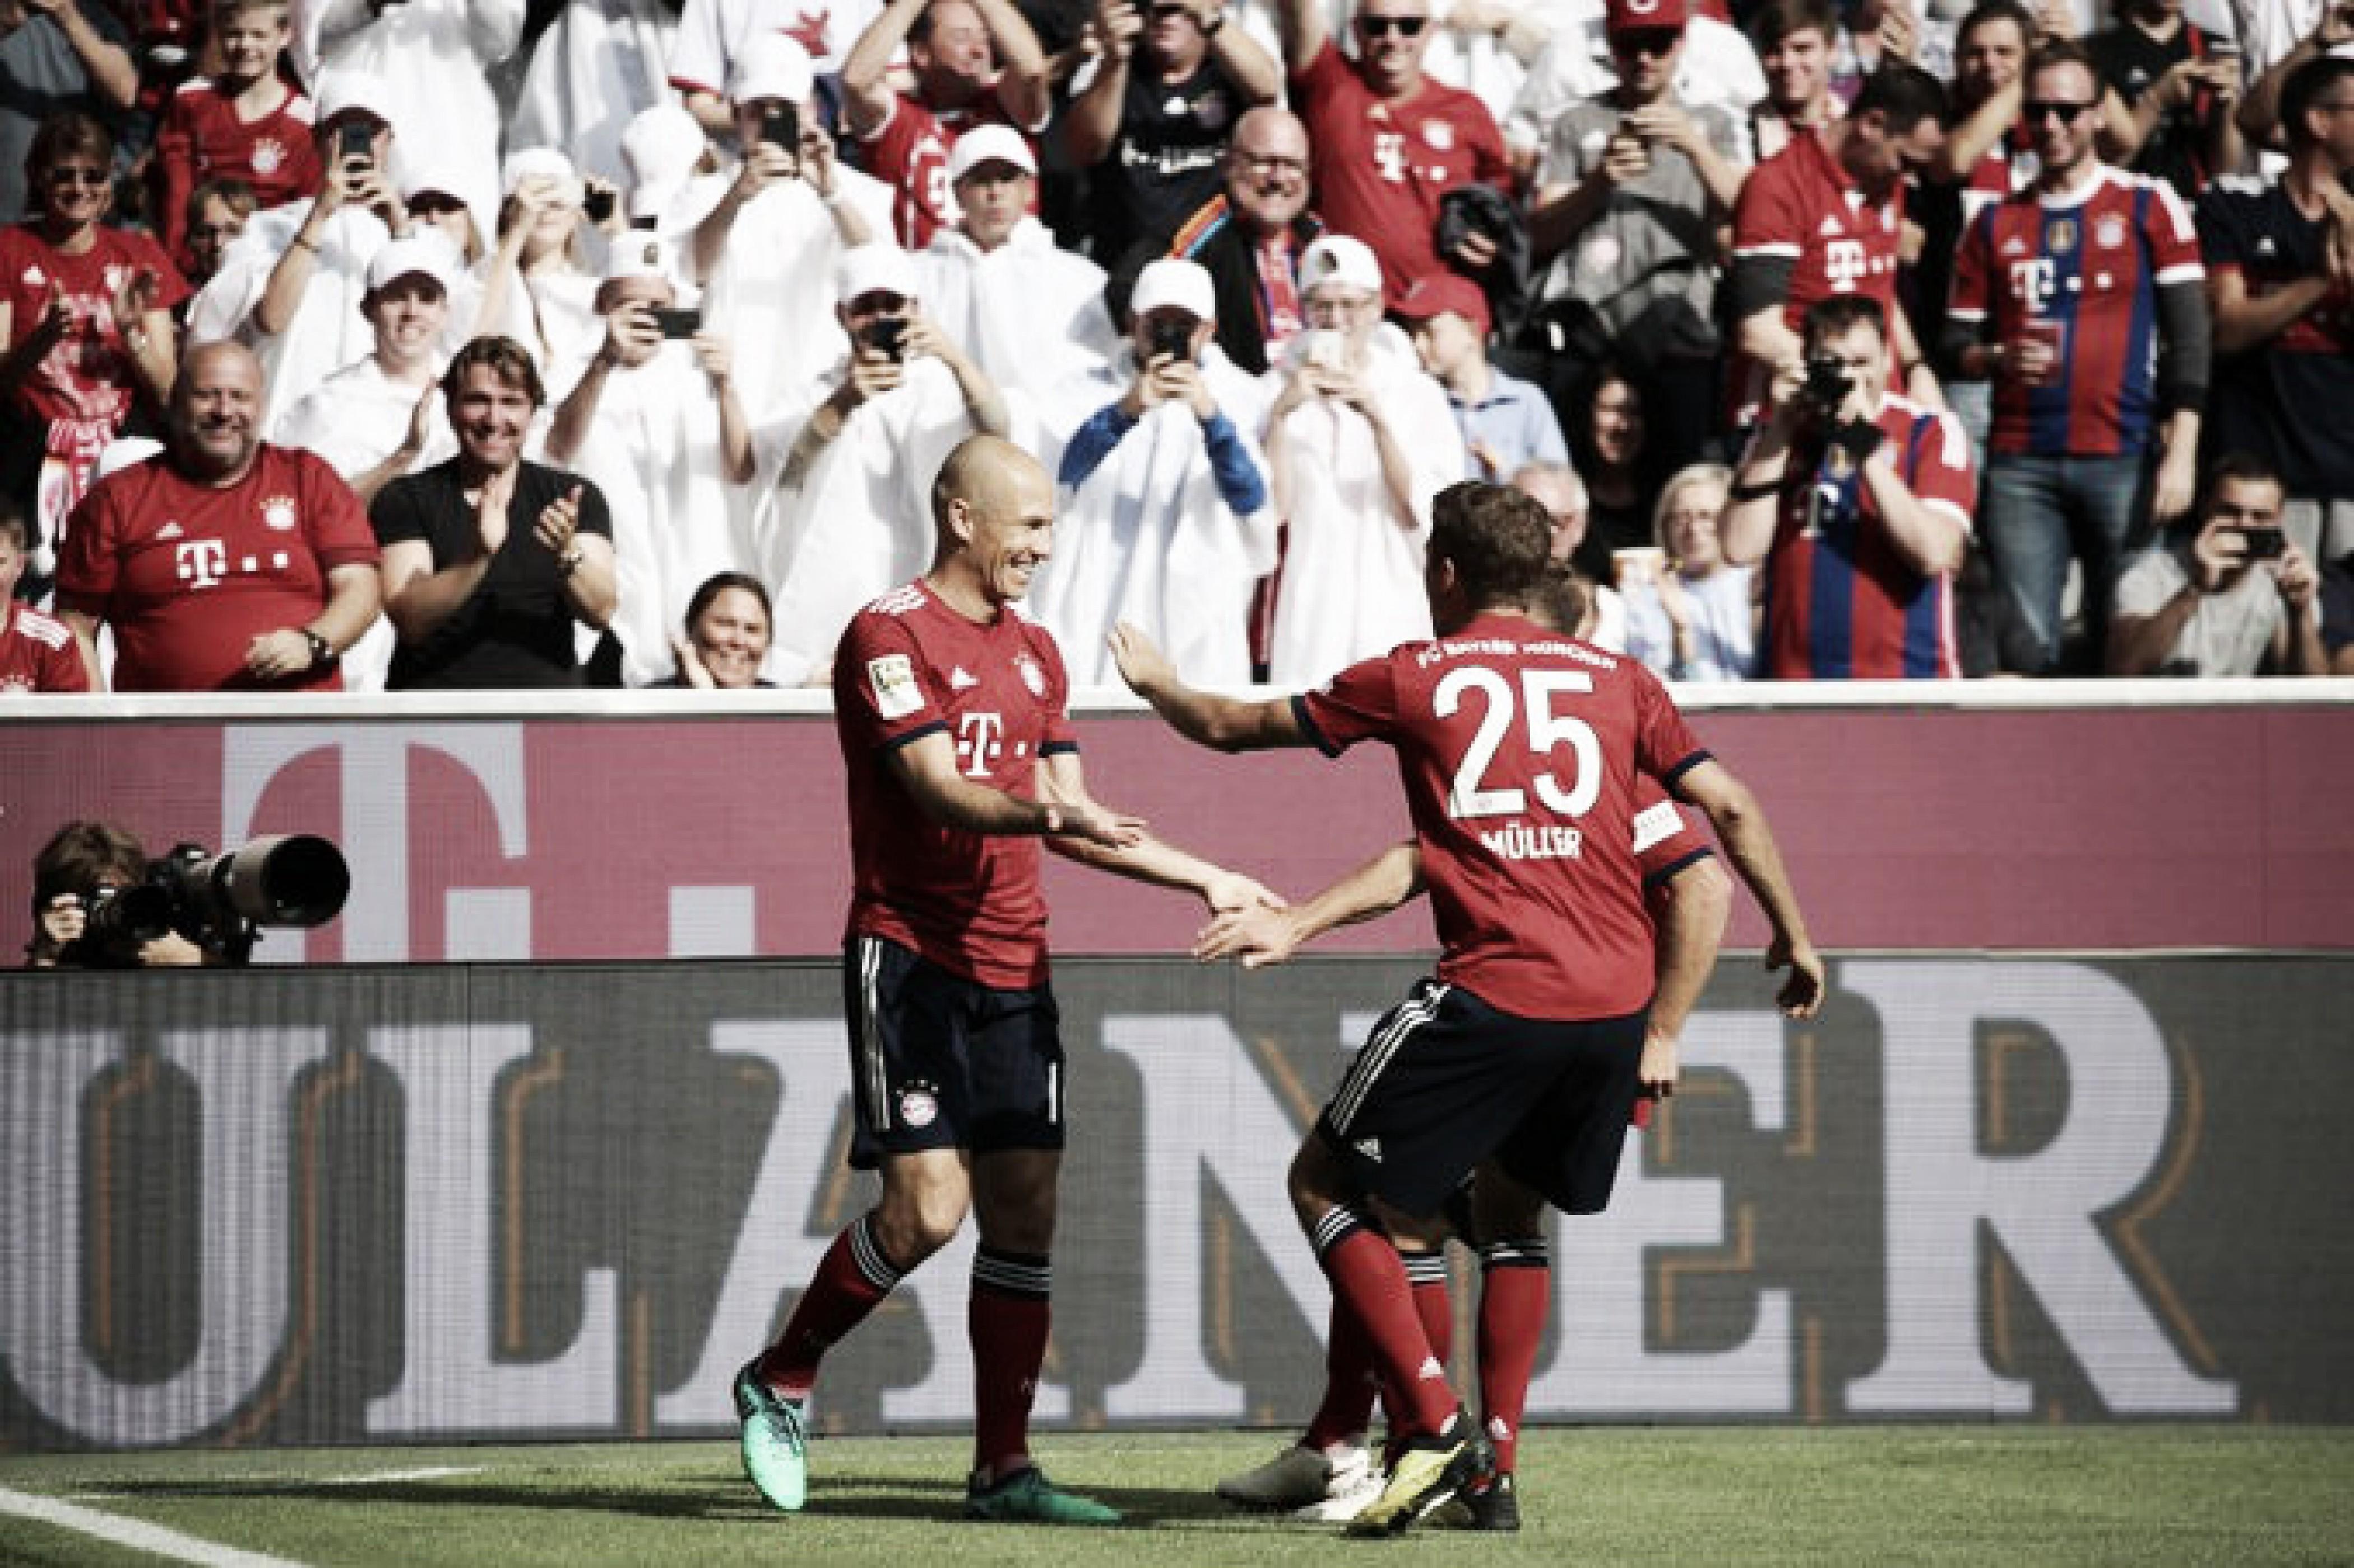 Bayern a la cabeza de la Bundesliga desde la tercera jornada